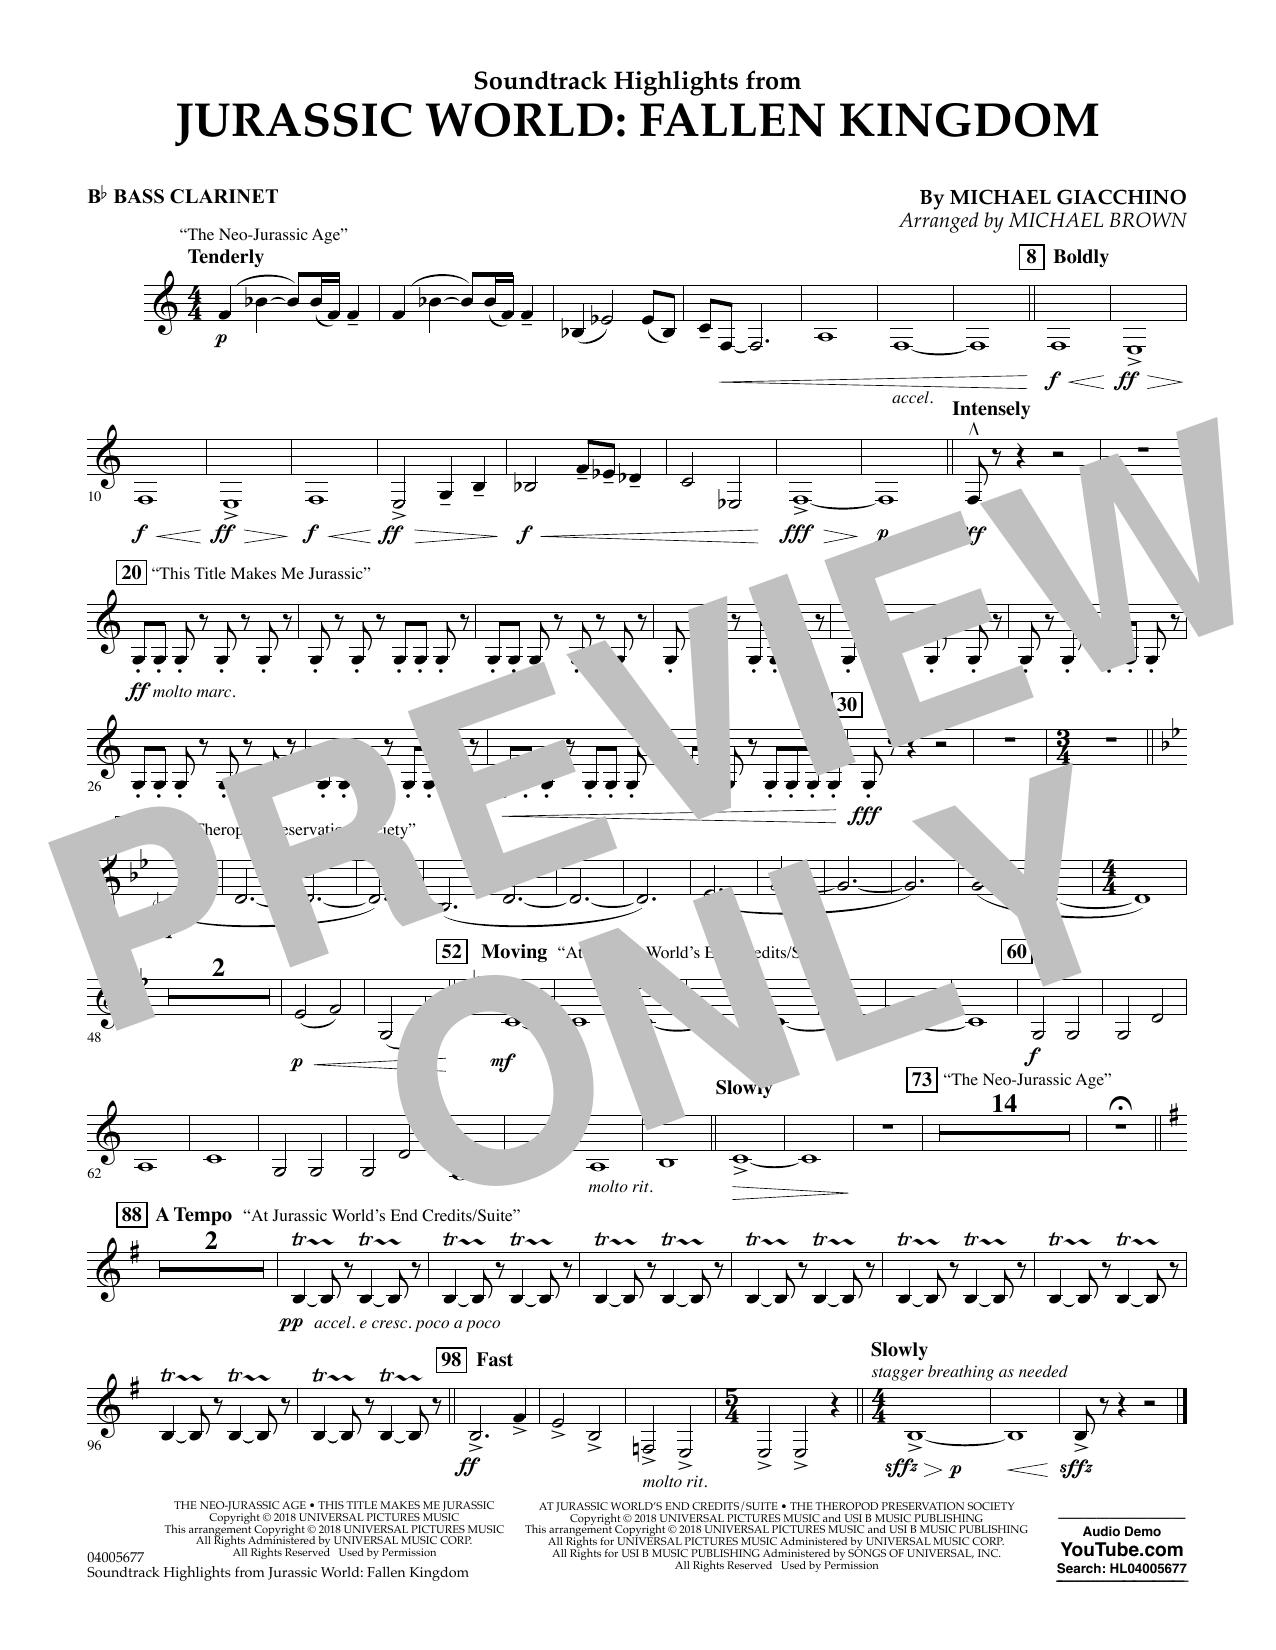 Highlights from Jurassic World: Fallen Kingdom (arr. Michael Brown) - Bb Bass Clarinet (Concert Band)